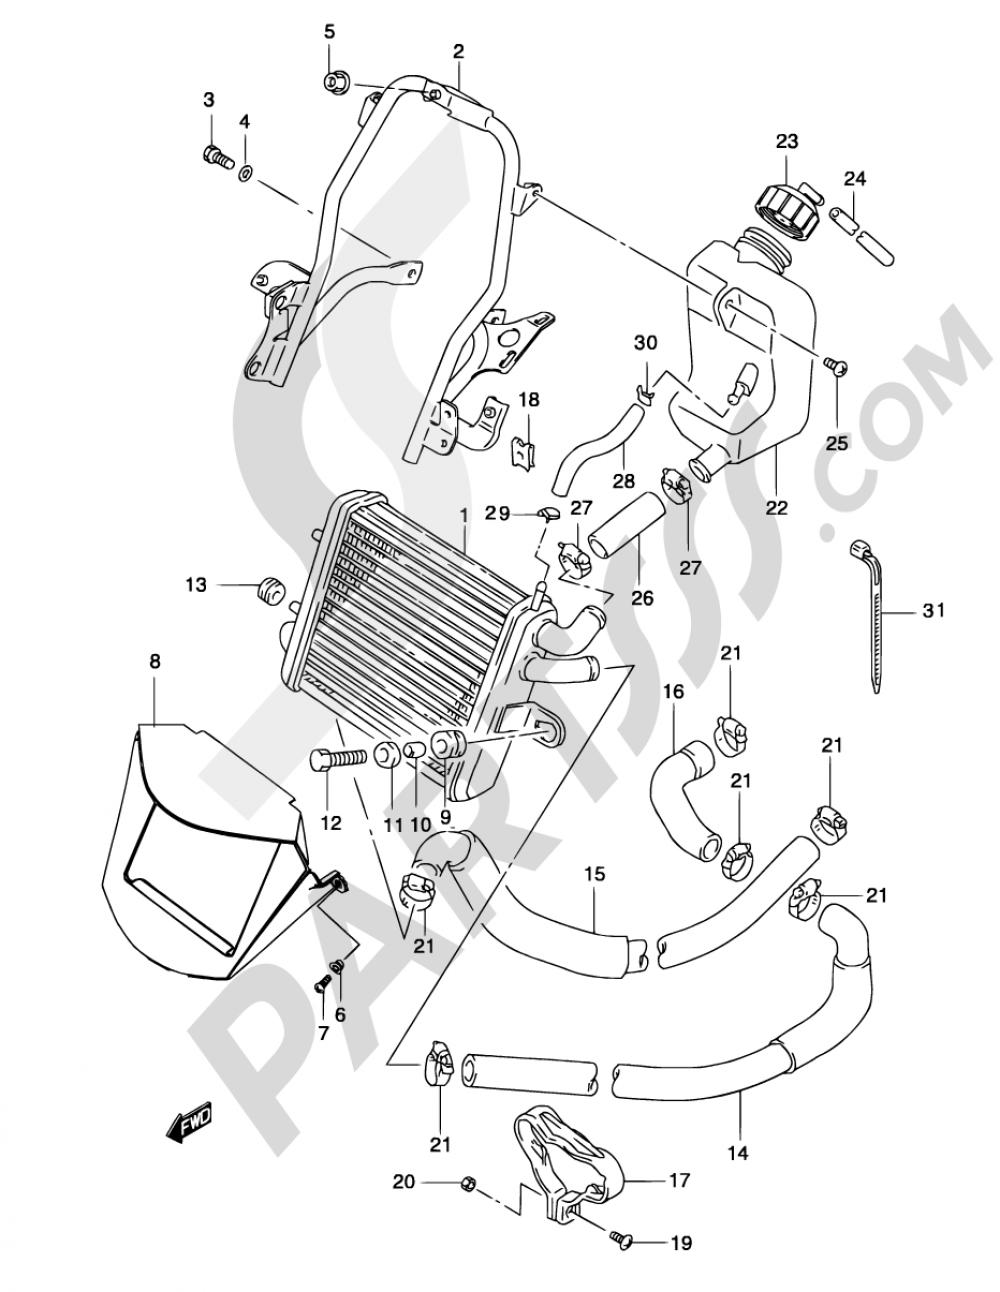 10 - RADIATOR (MODEL  AY50WR K1/K2/AY50W K3/K4) Suzuki KATANA AY50WR 2001